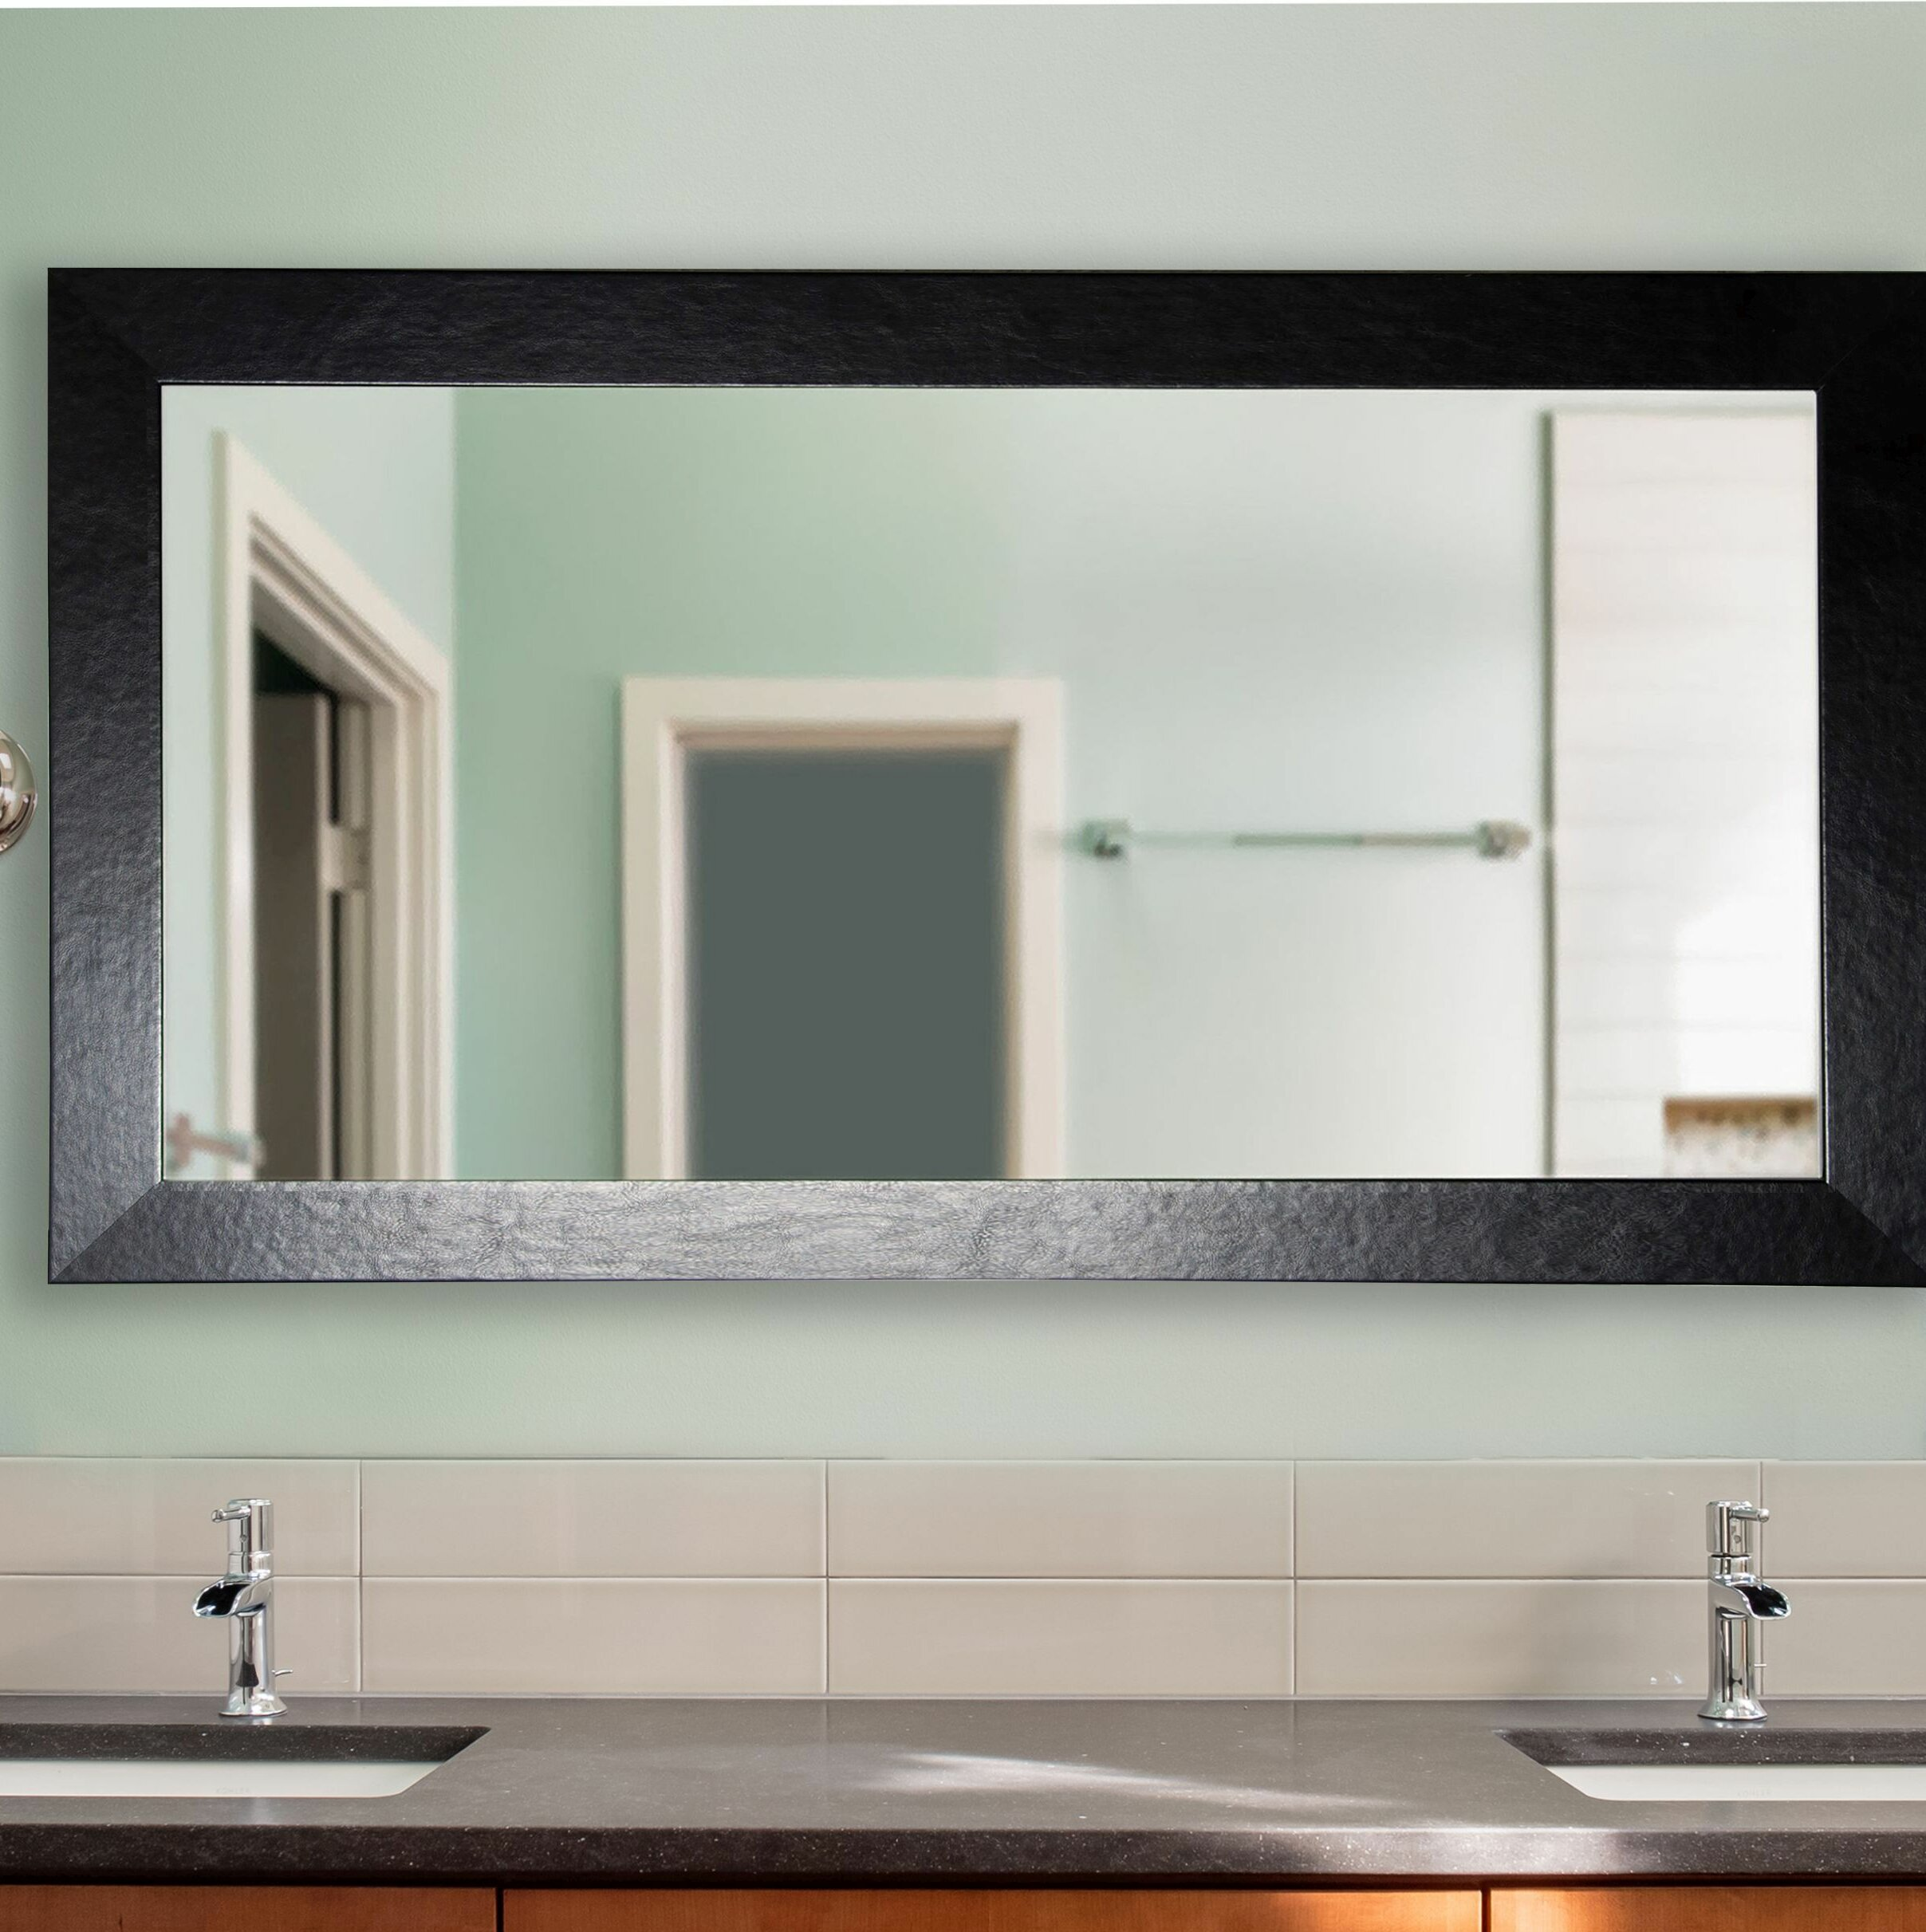 Red Barrel Studio Marpain Wide Bathroom Vanity Mirror Reviews Wayfair